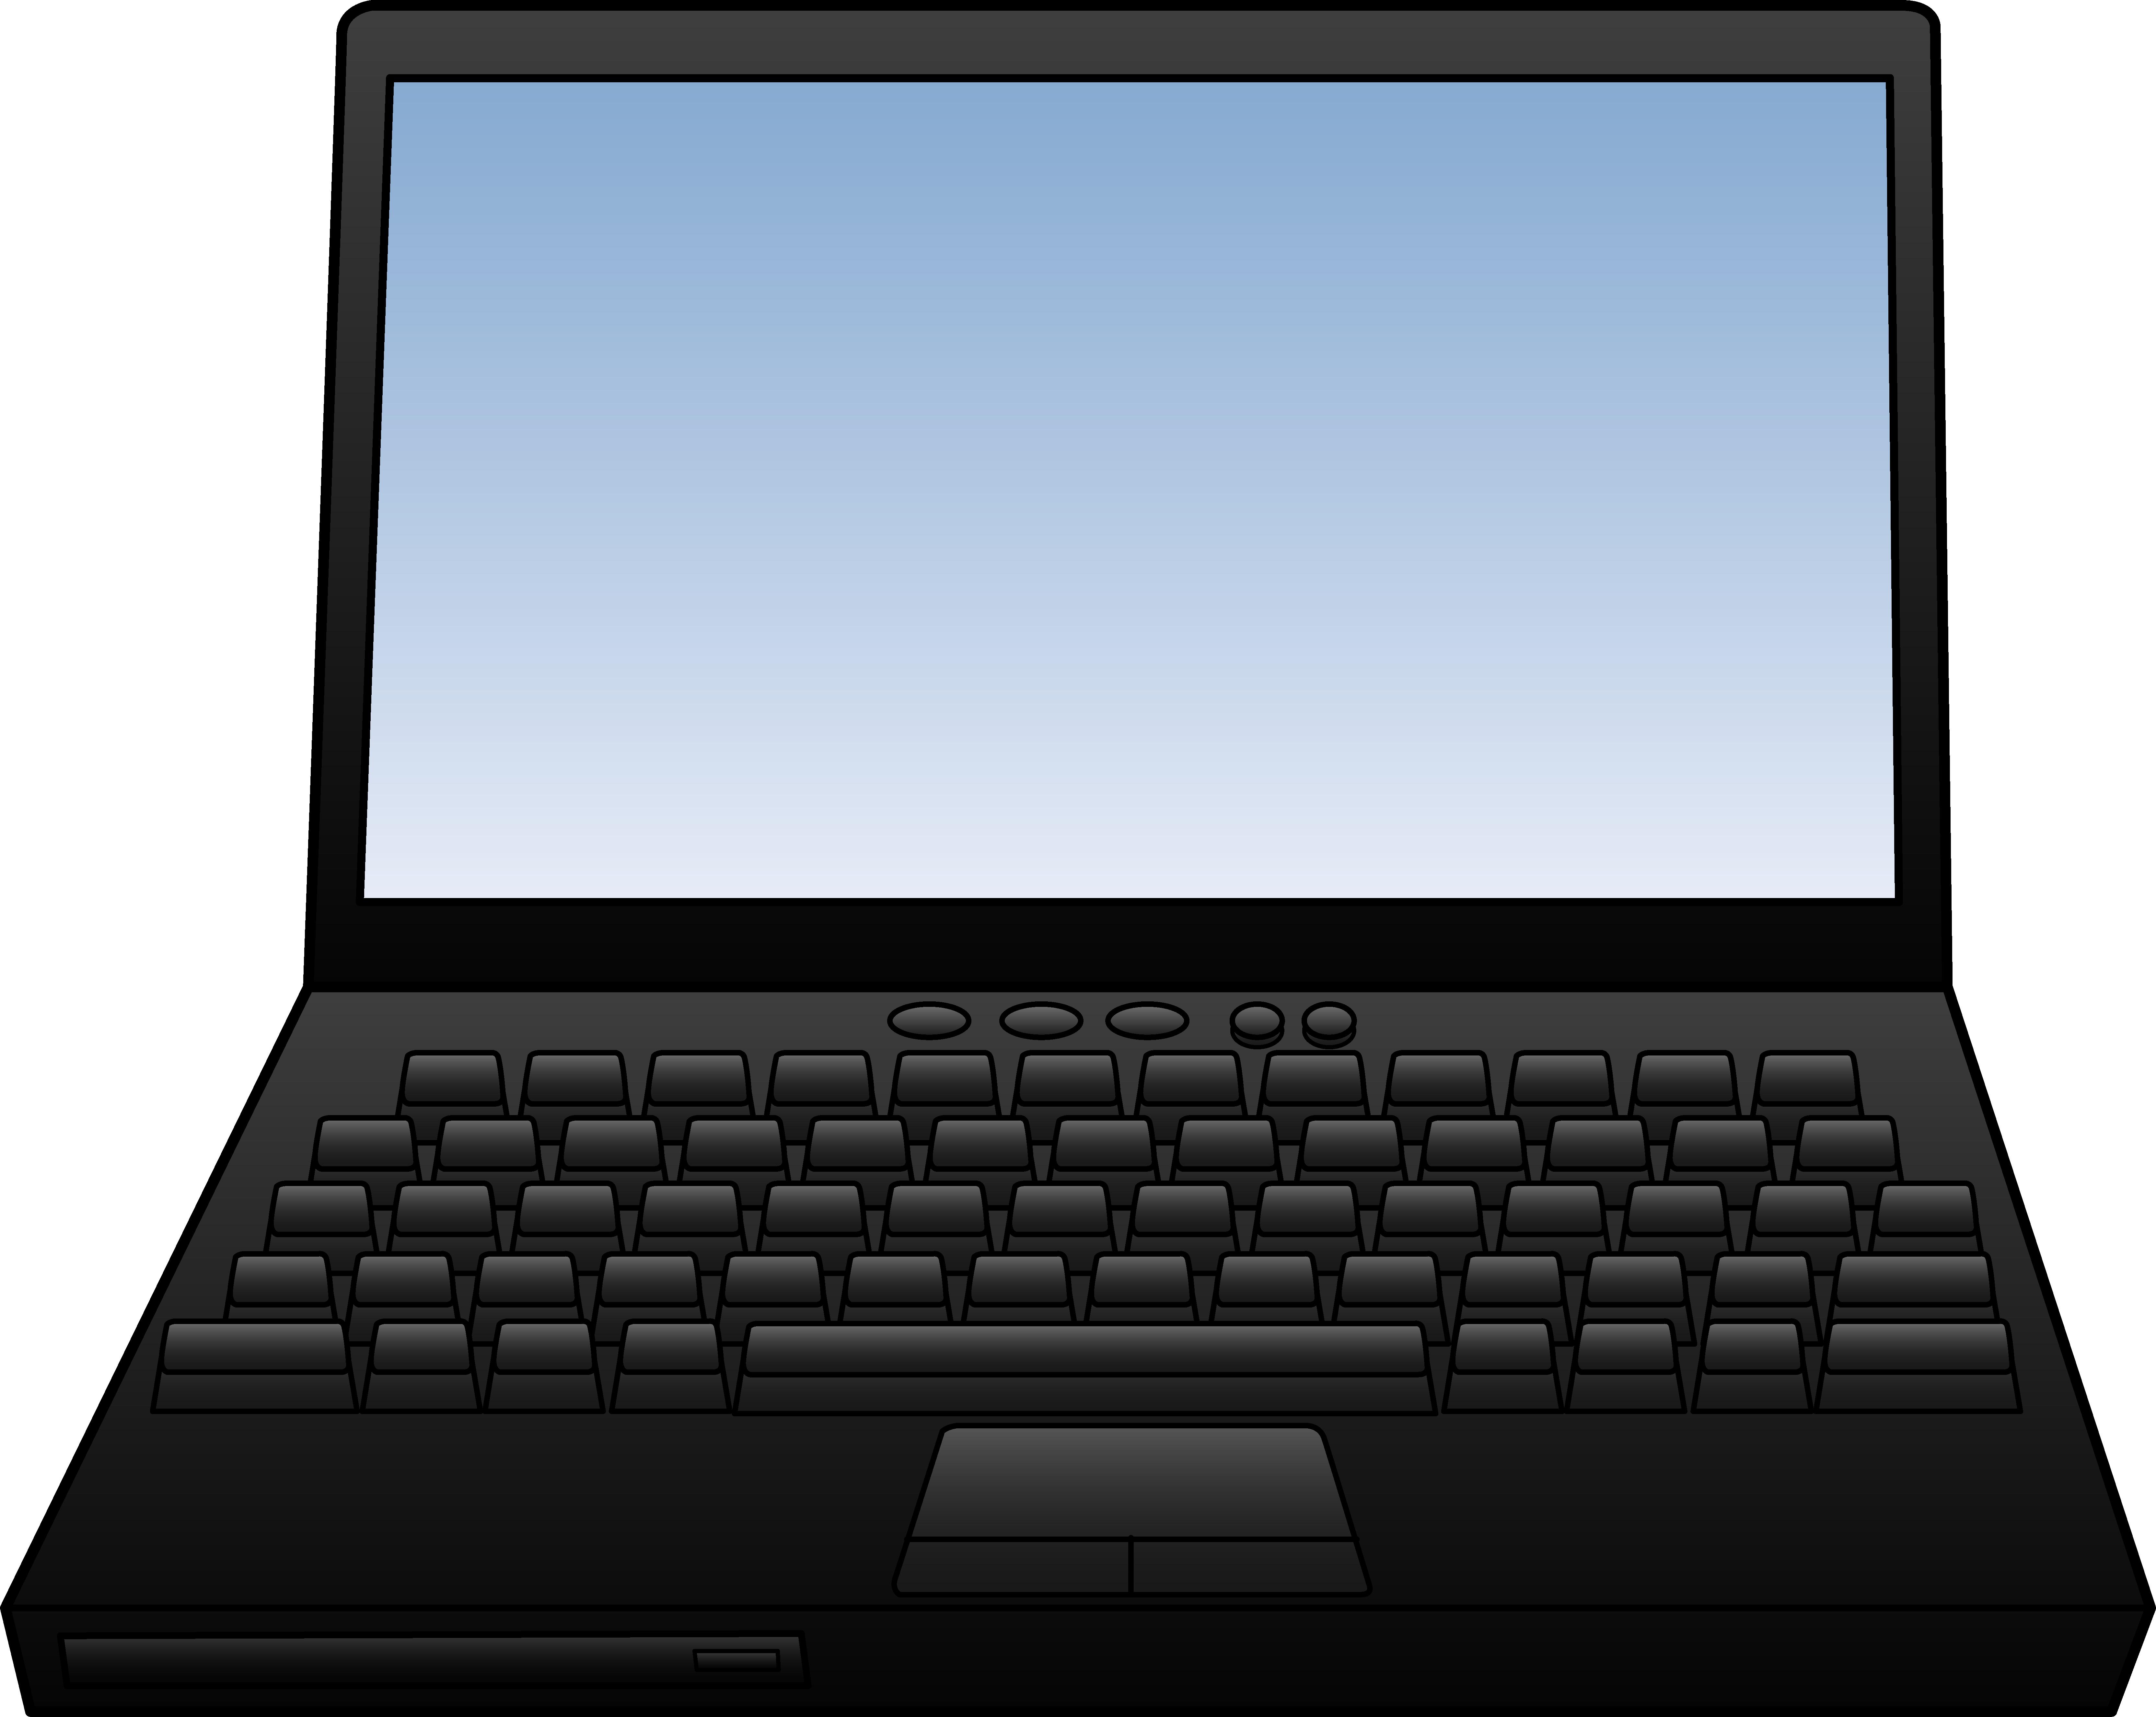 Laptop clipart Laptop Art FreeClipart Design Free